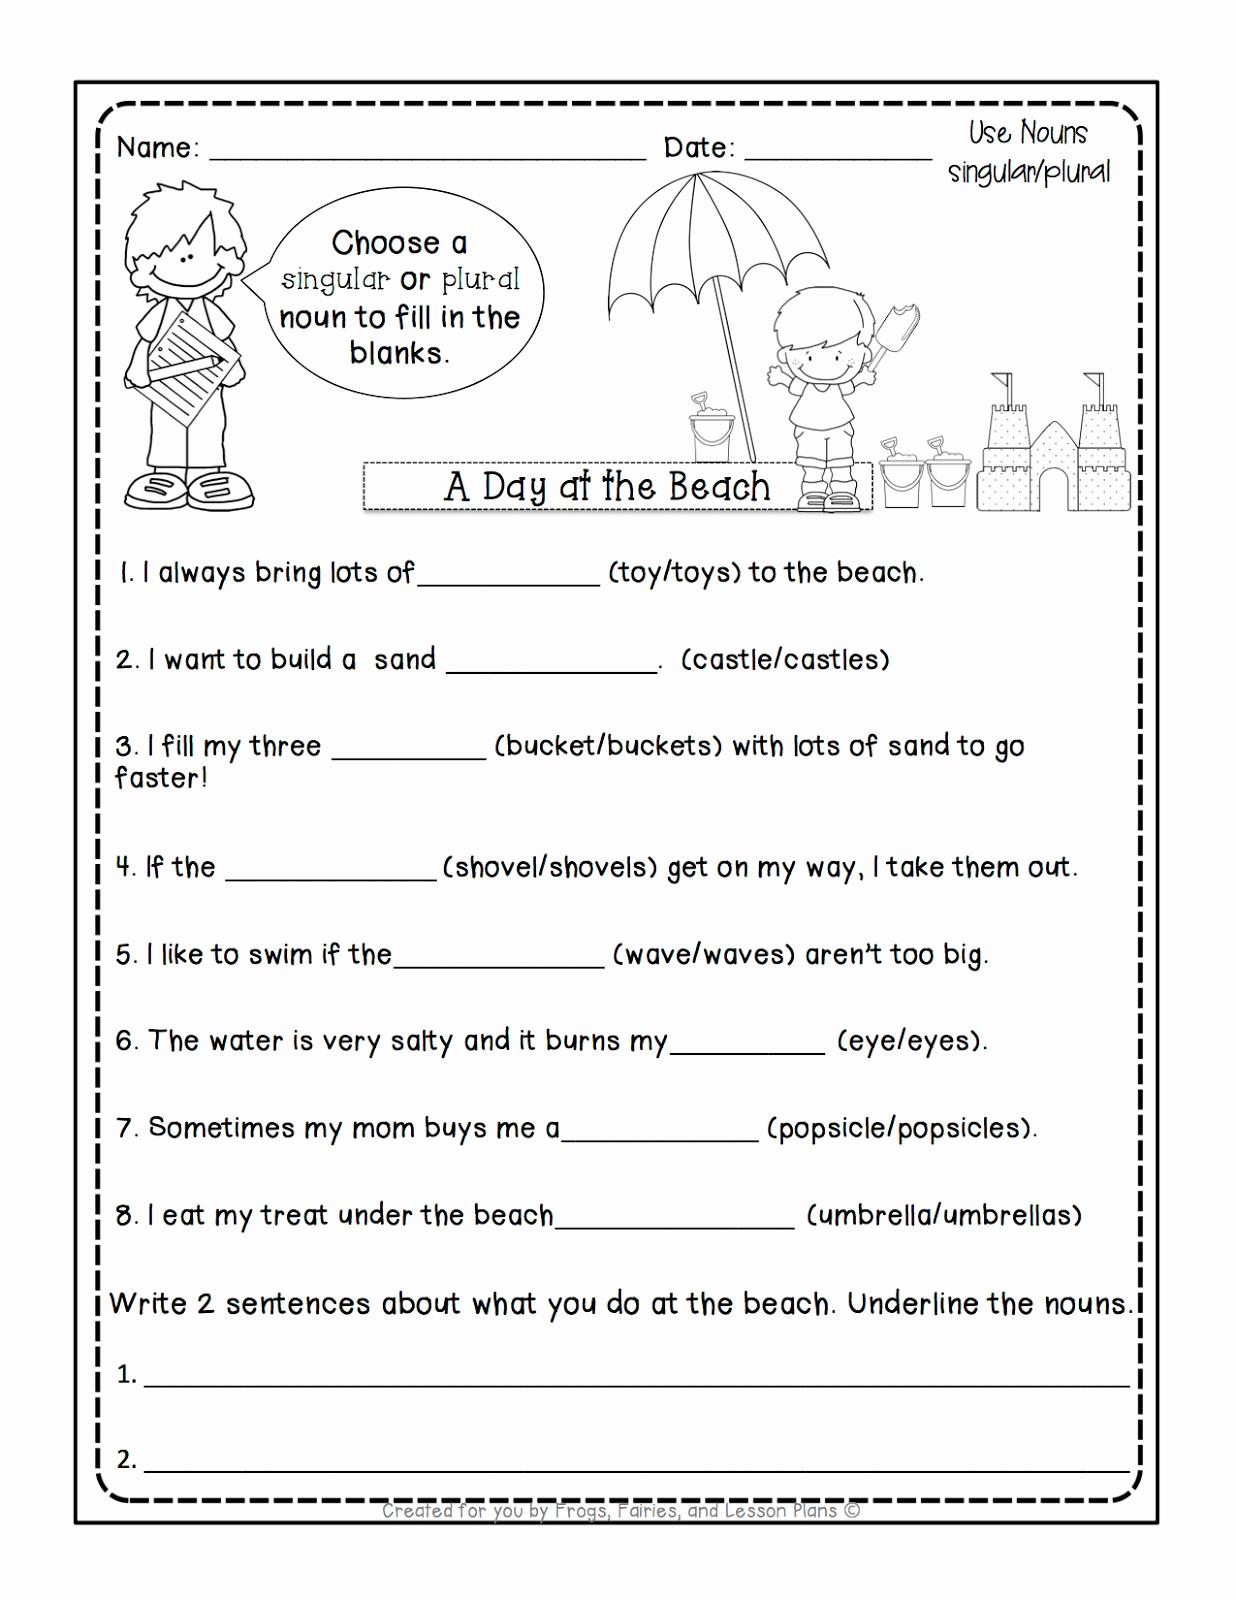 Possessive Pronouns Worksheet 2nd Grade New 20 Possessive Nouns Worksheet 2nd Grade